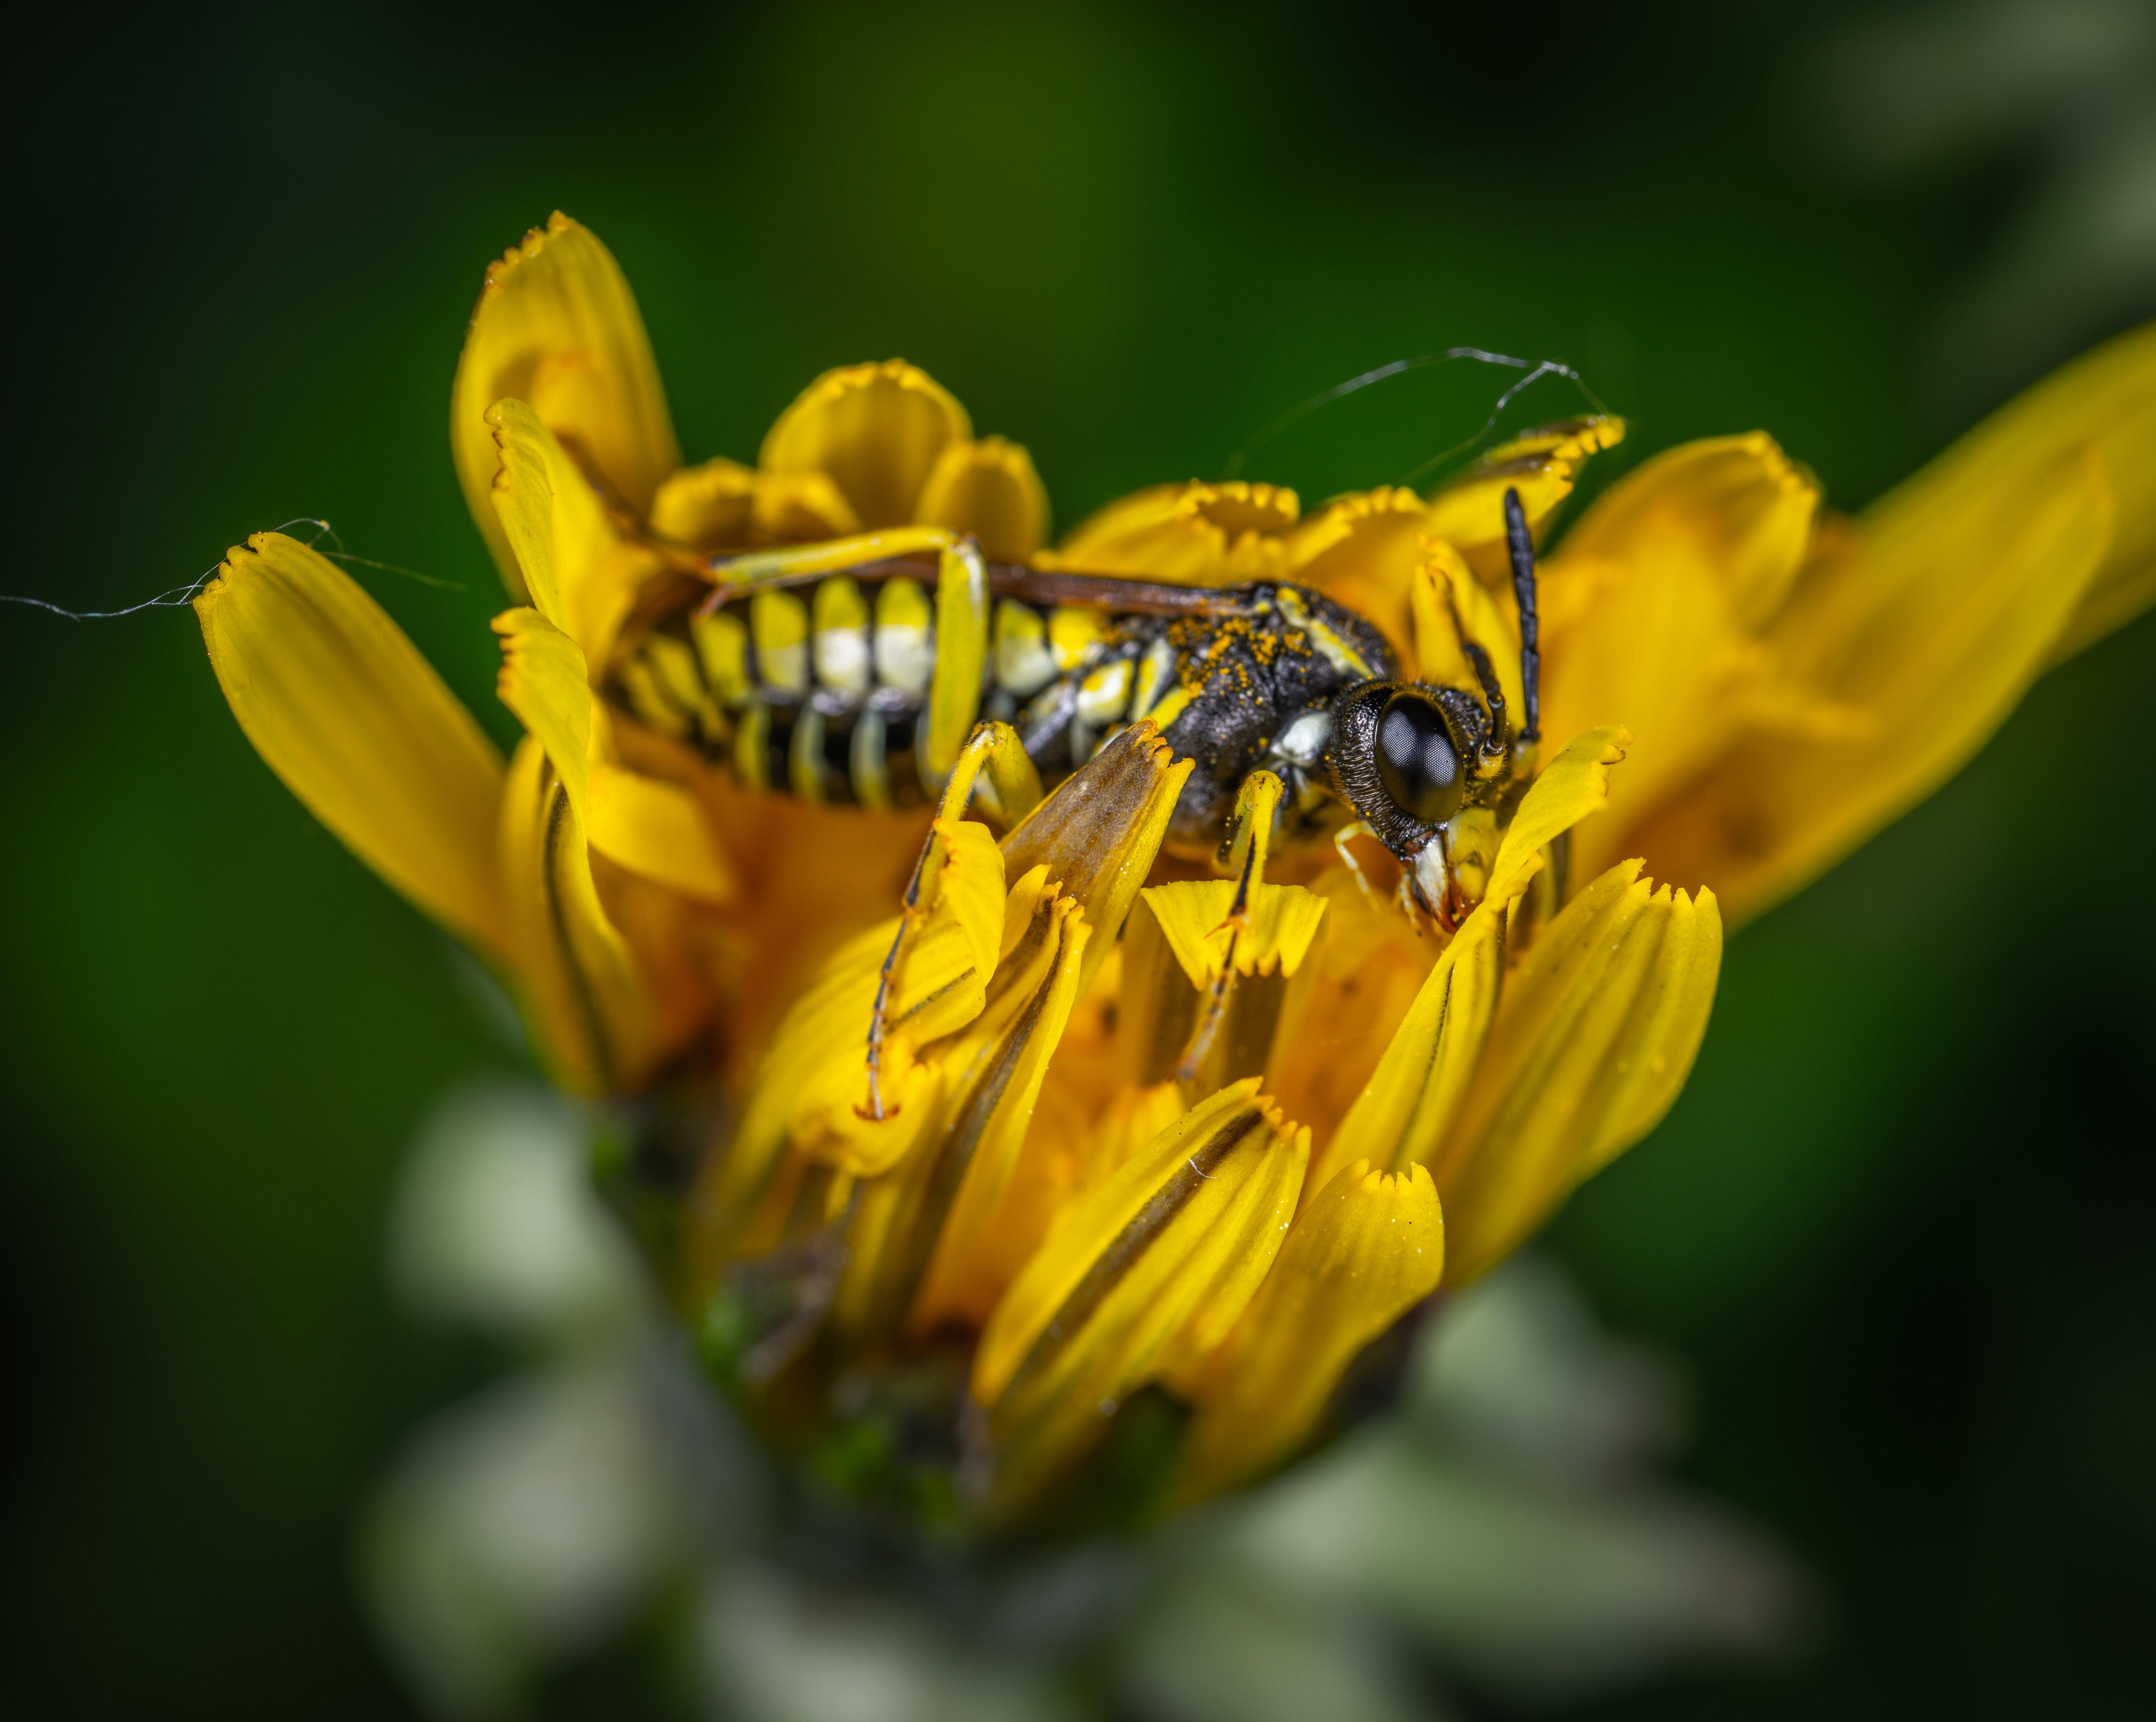 Bee on Yellow Petaled Flower